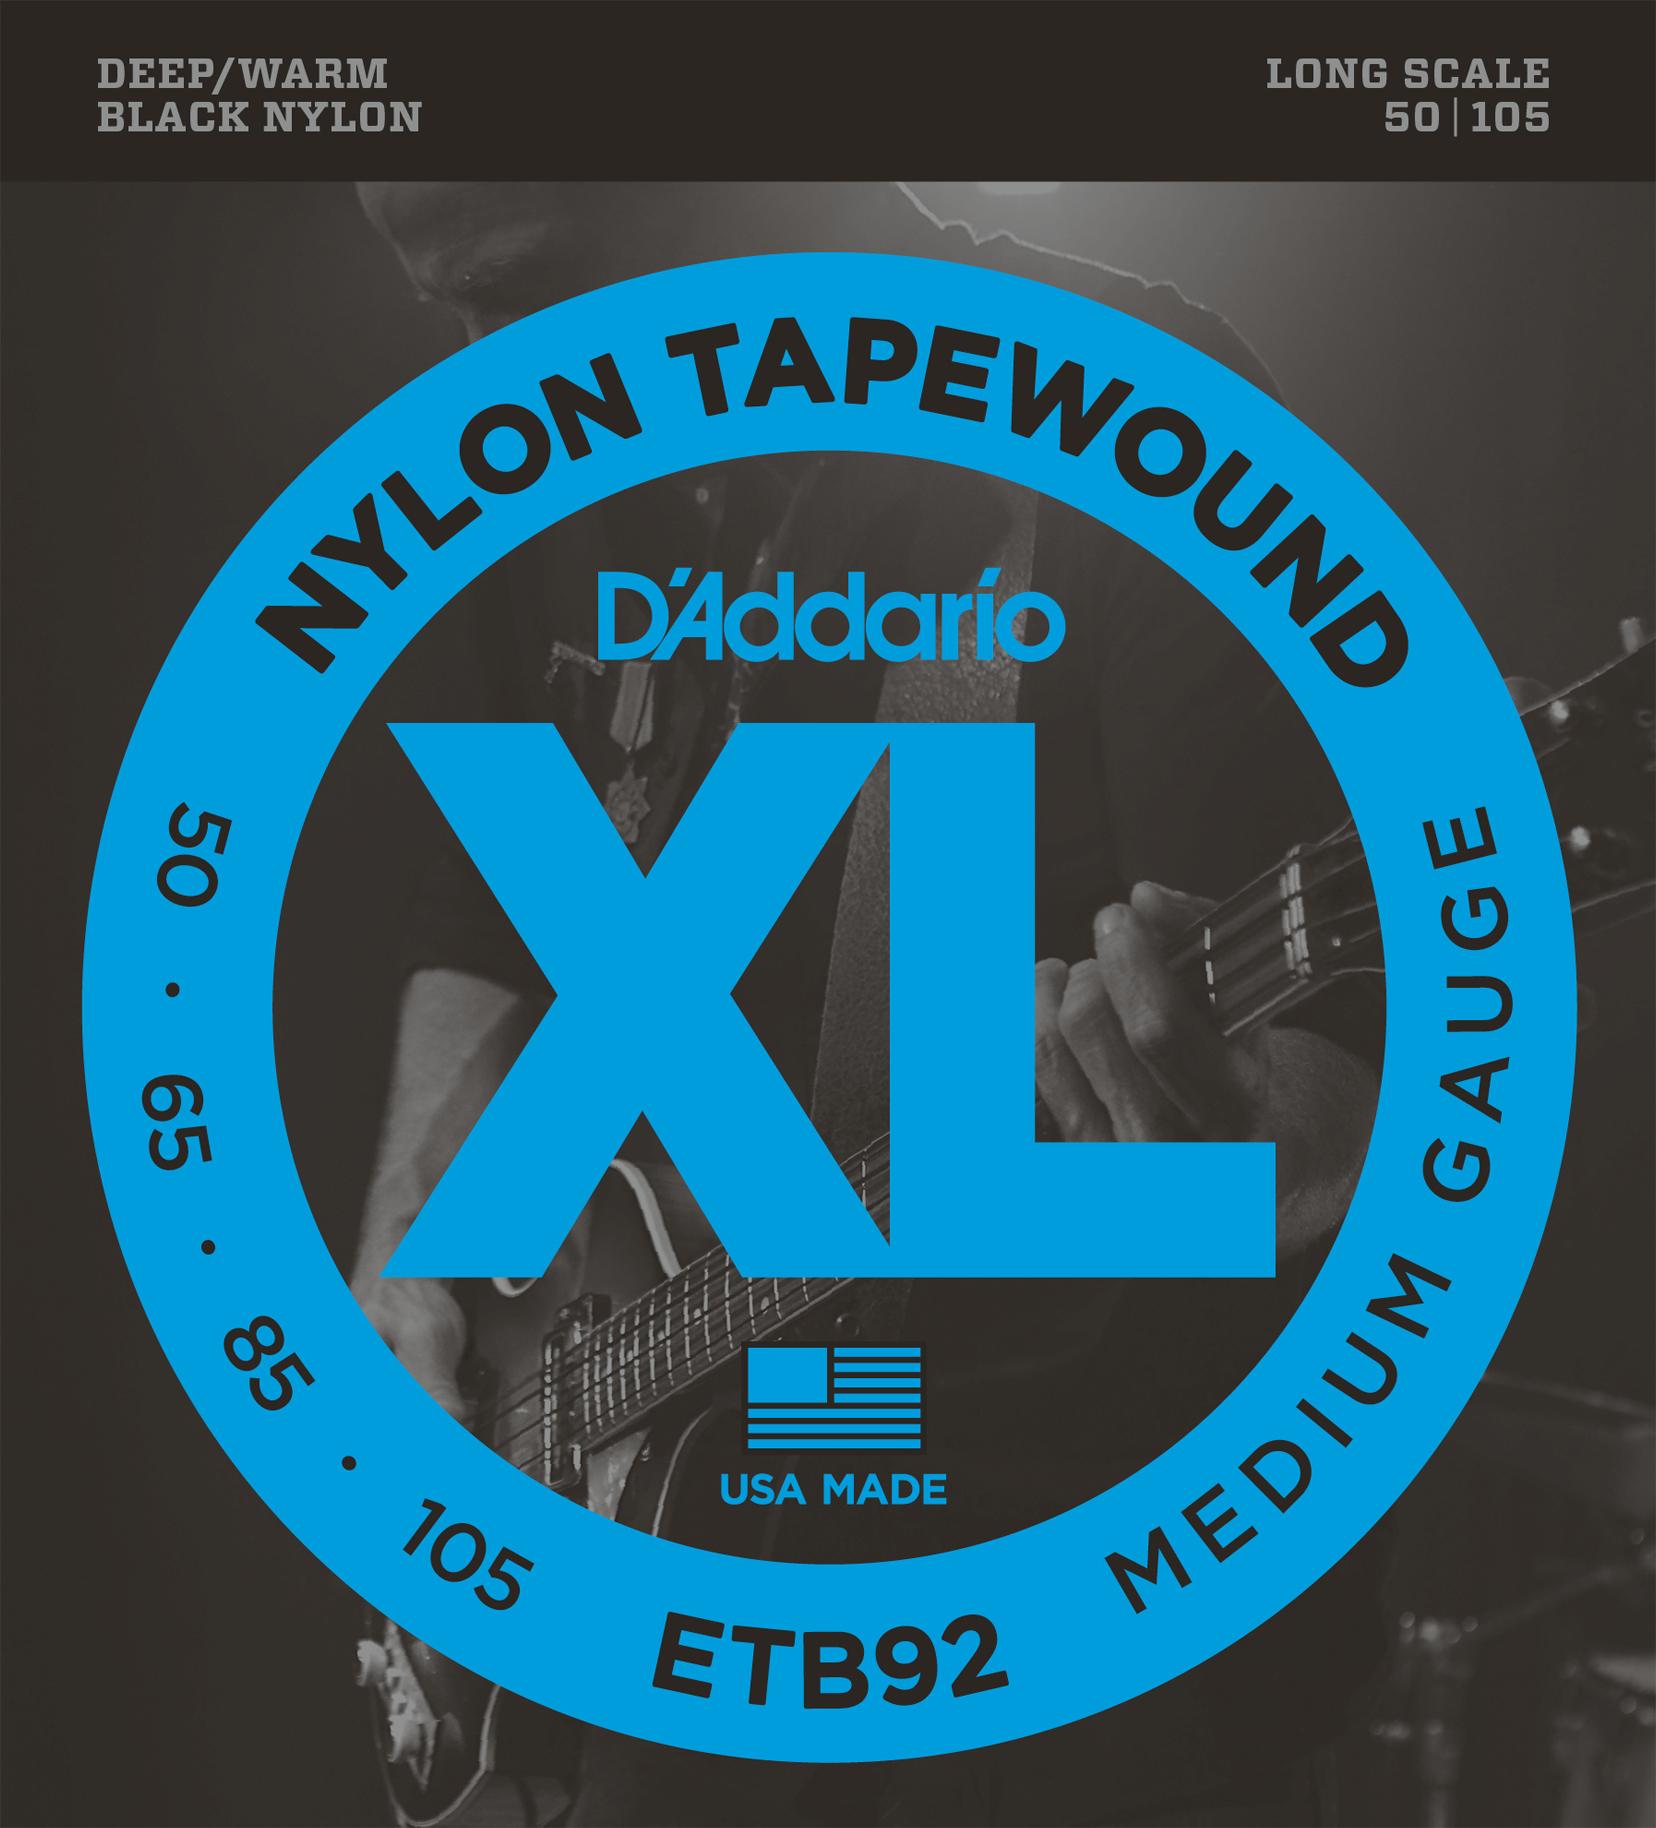 D'Addario ETB92 Tapewound Bass Guitar Strings, Medium, 50-105 Long Scale